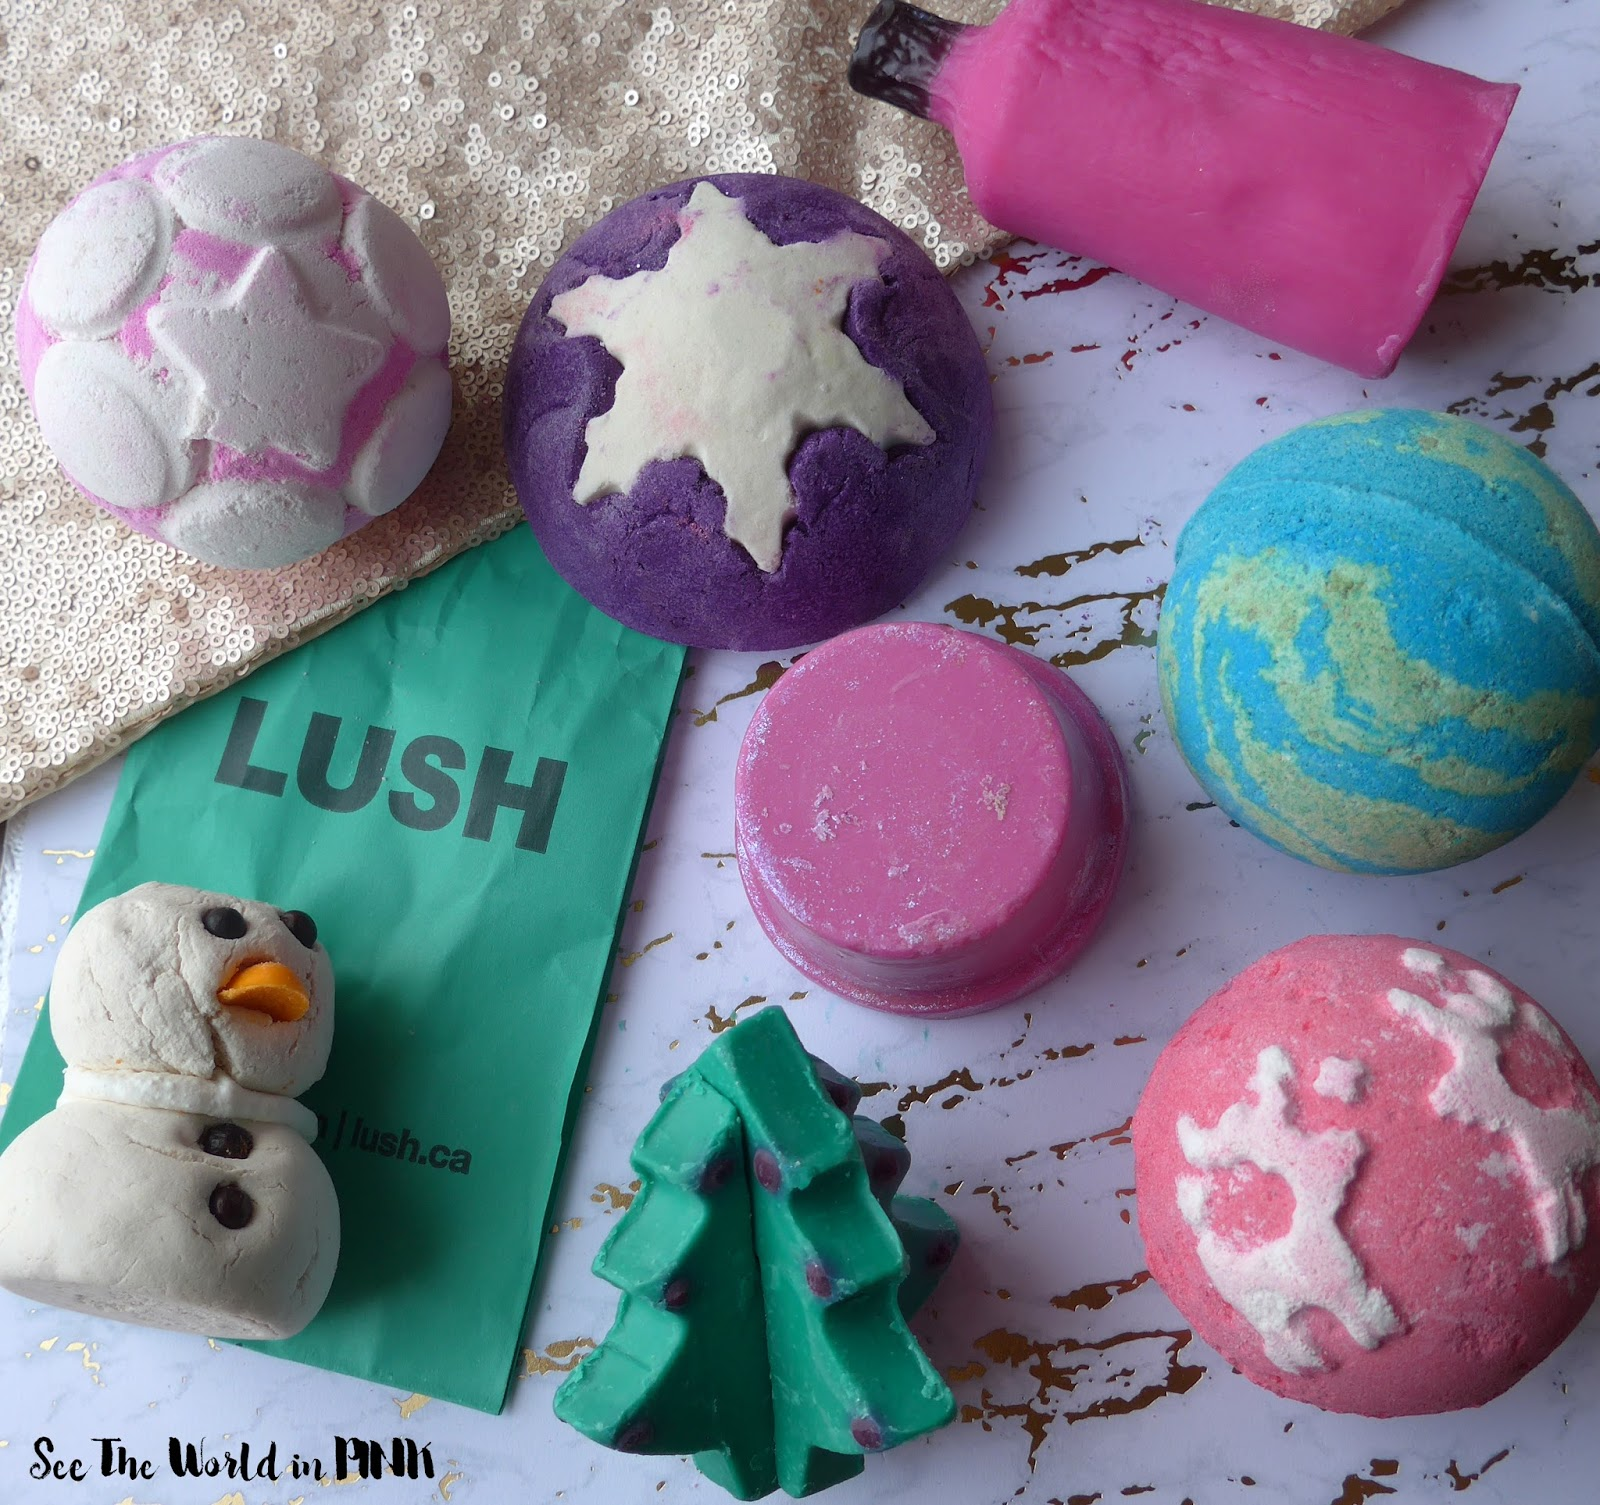 Skincare Sunday - Lush Christmas Collection!